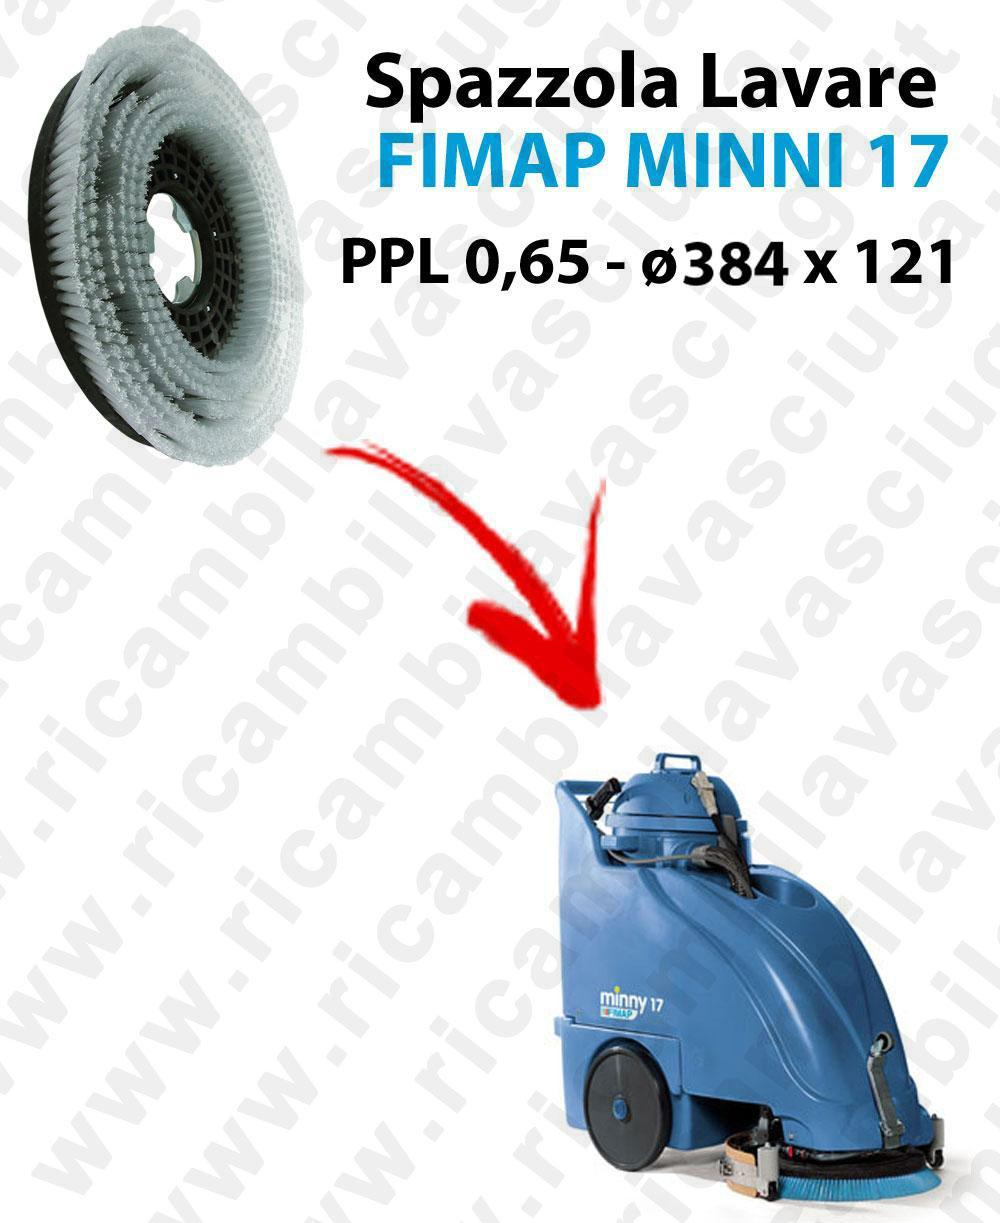 CEPILLO DE LAVADO  para fregadora FIMAP MINNY 17. modelo: PPL 0